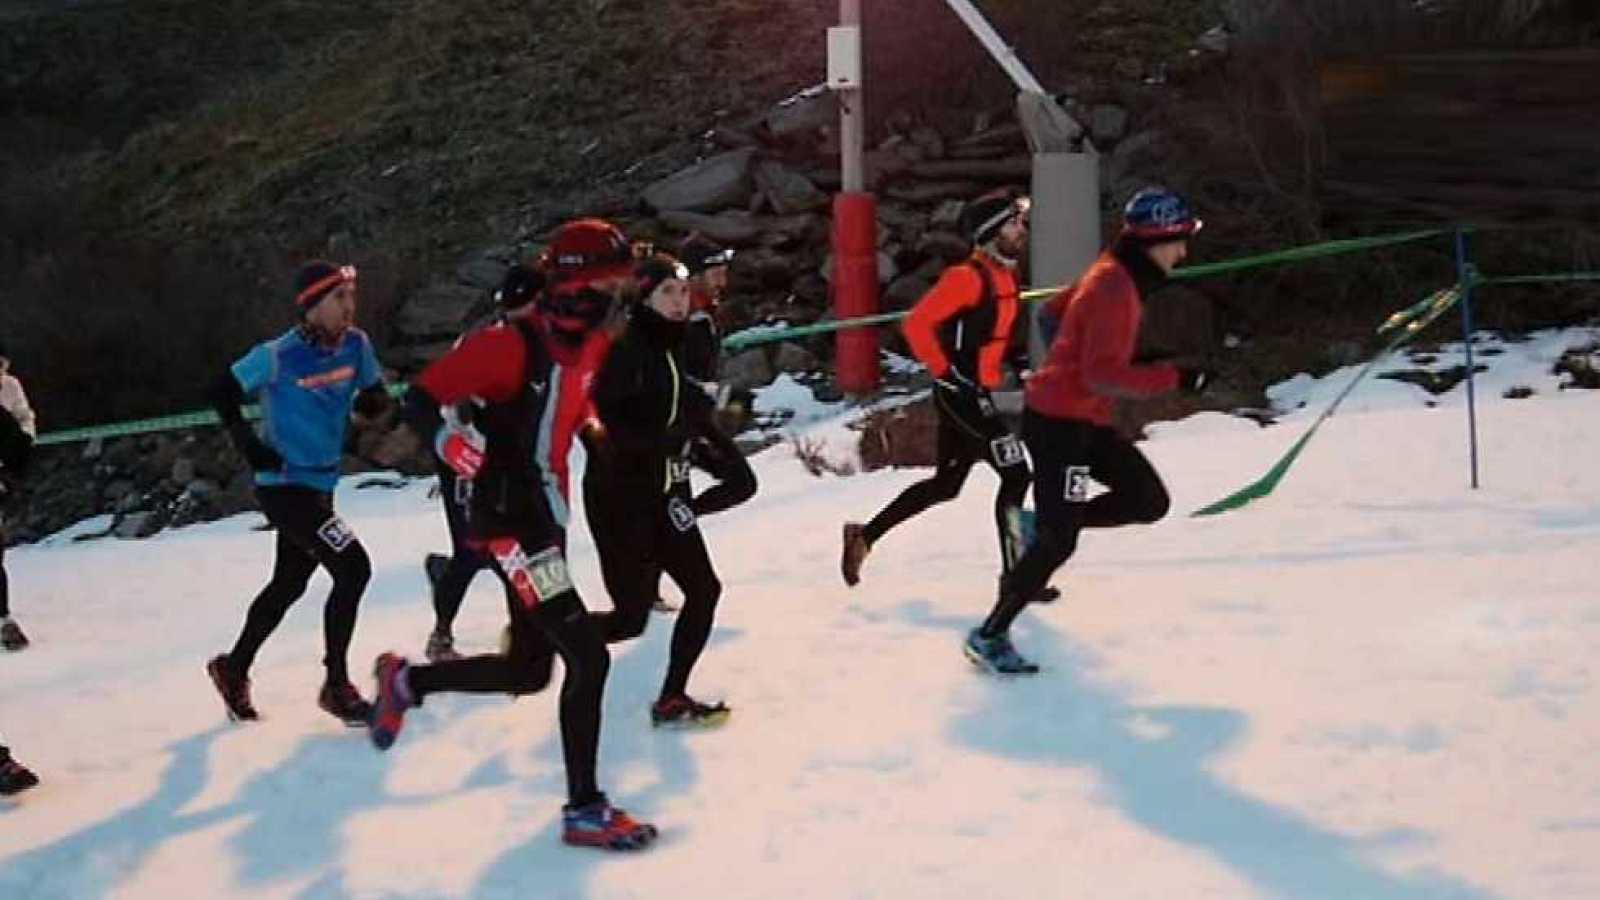 0147ccd1b99d7 Para todos los públicos Carrera de Montaña - Gran Premio Ternua Snow Running  Sierra Nevada 2016 - Ver ahora reproducir video